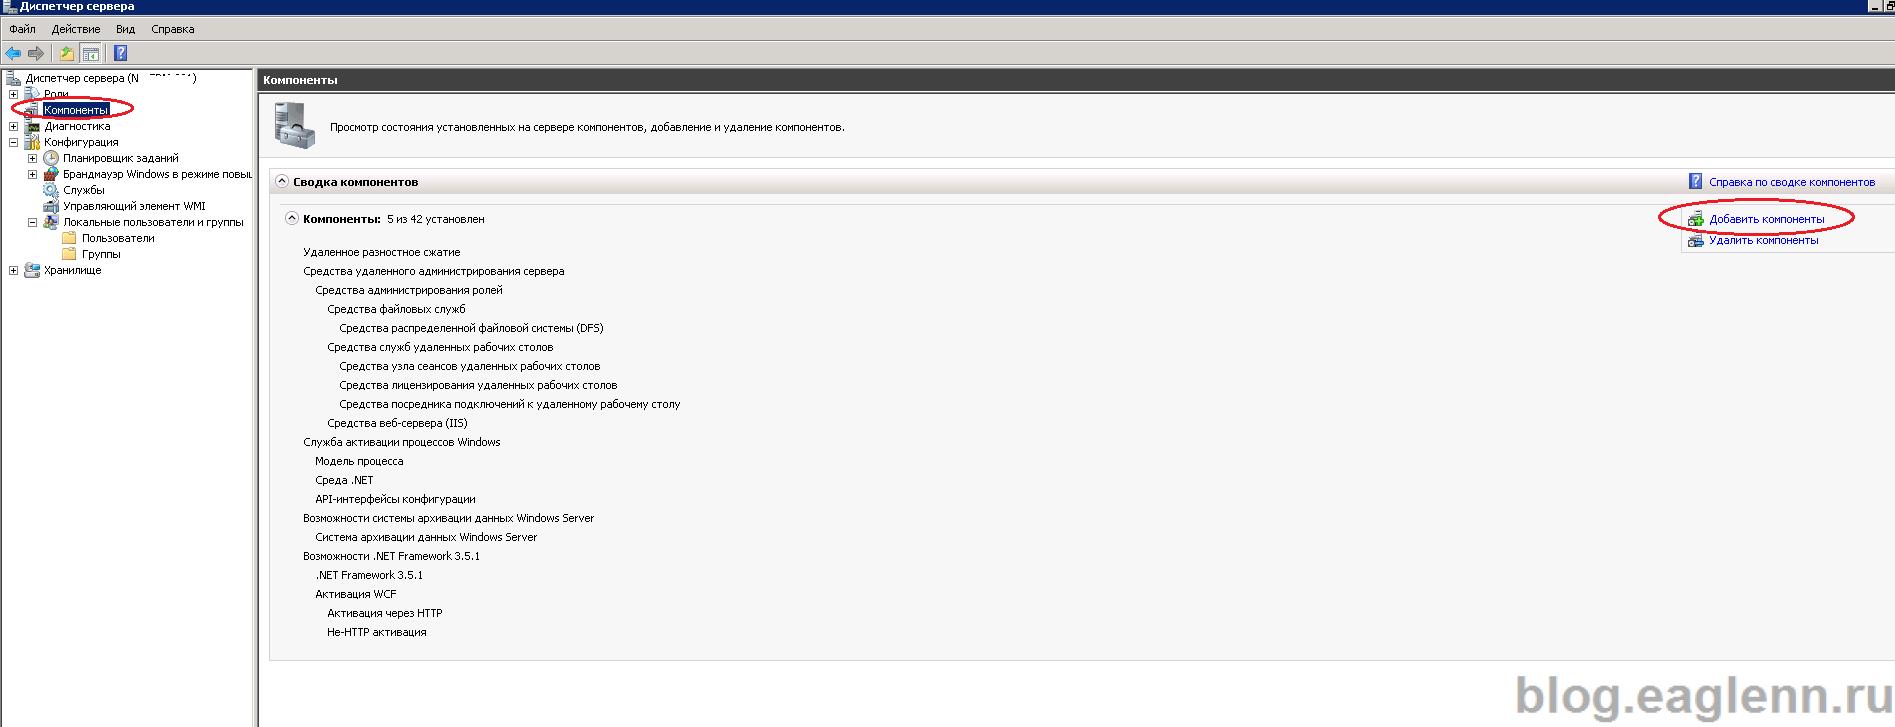 Windows Server 2008 R2 установка компонентов